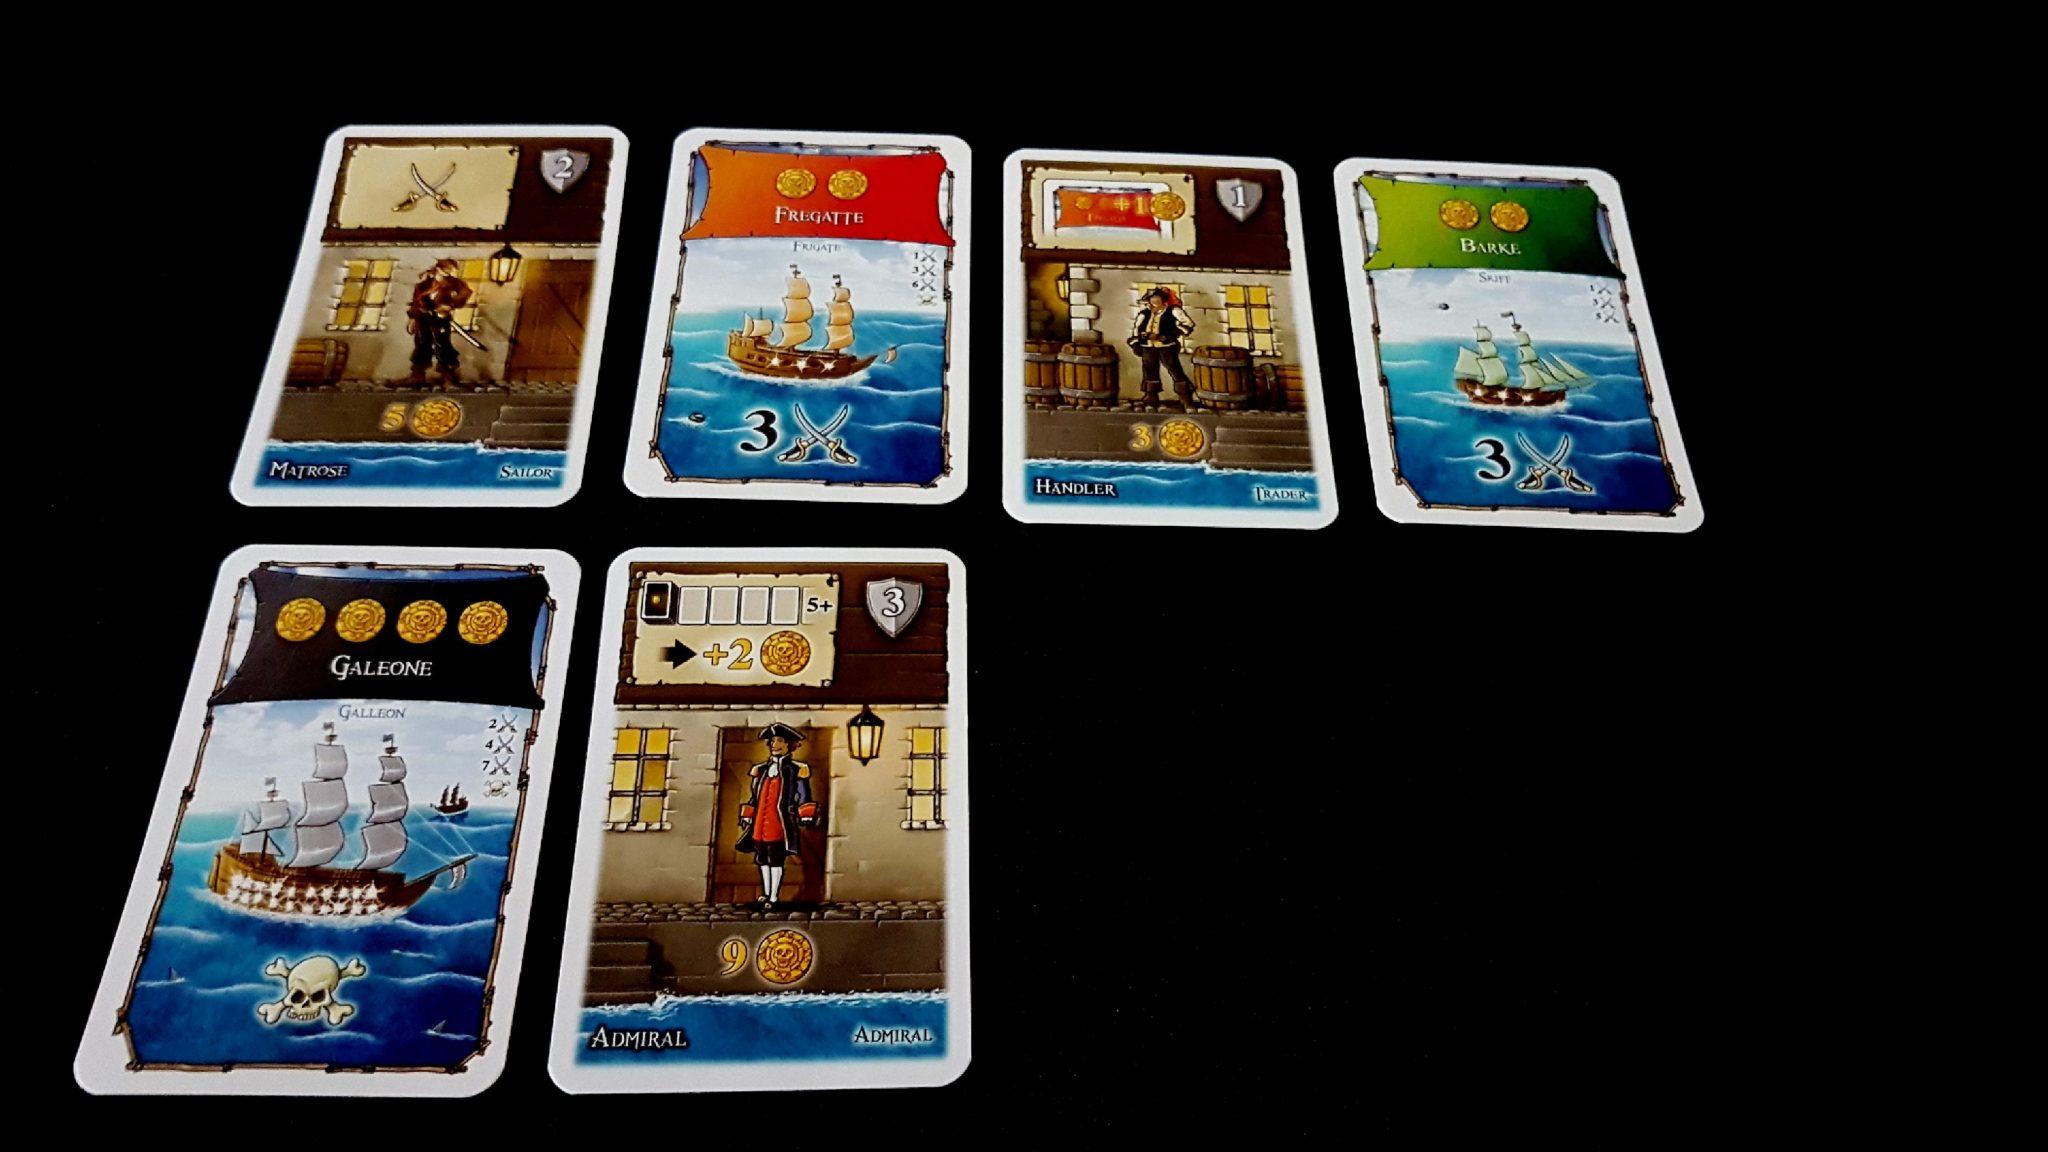 Six cards